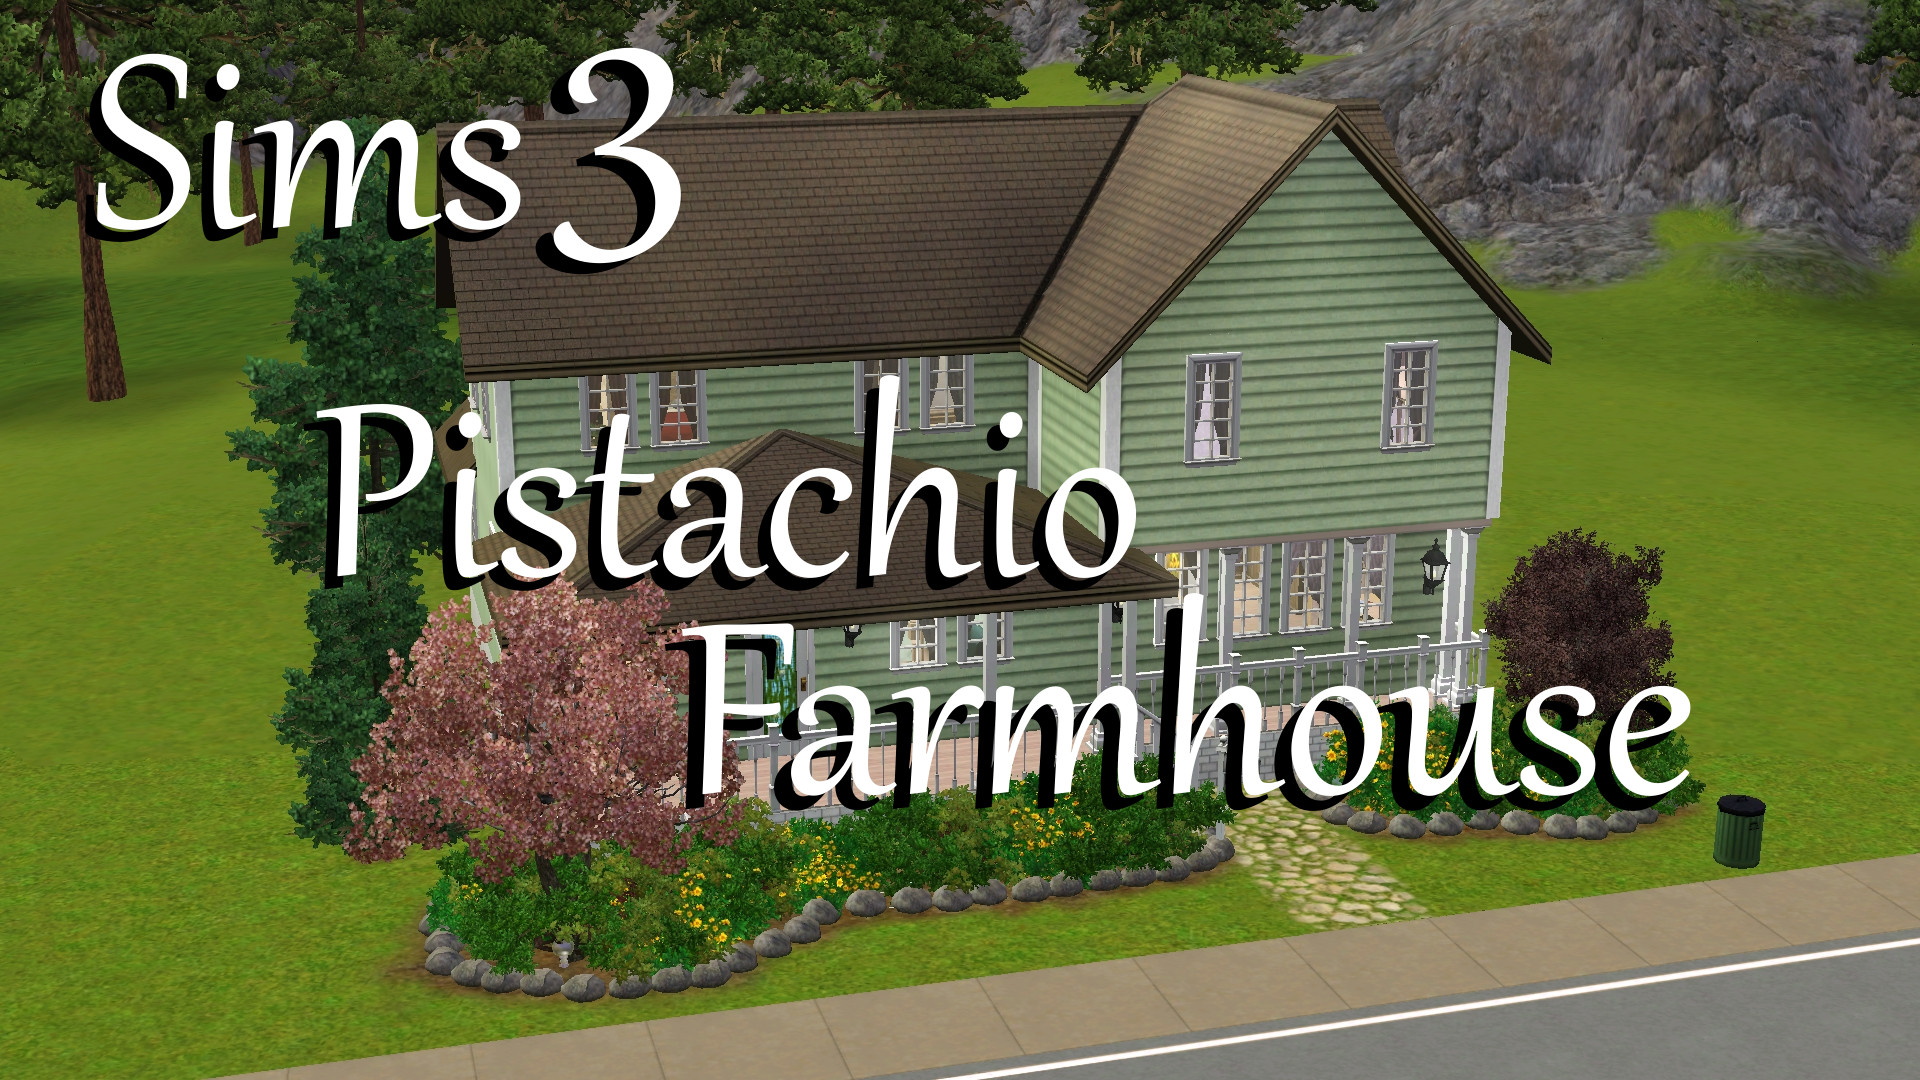 Pistachio farmhouse 3bed 2bath